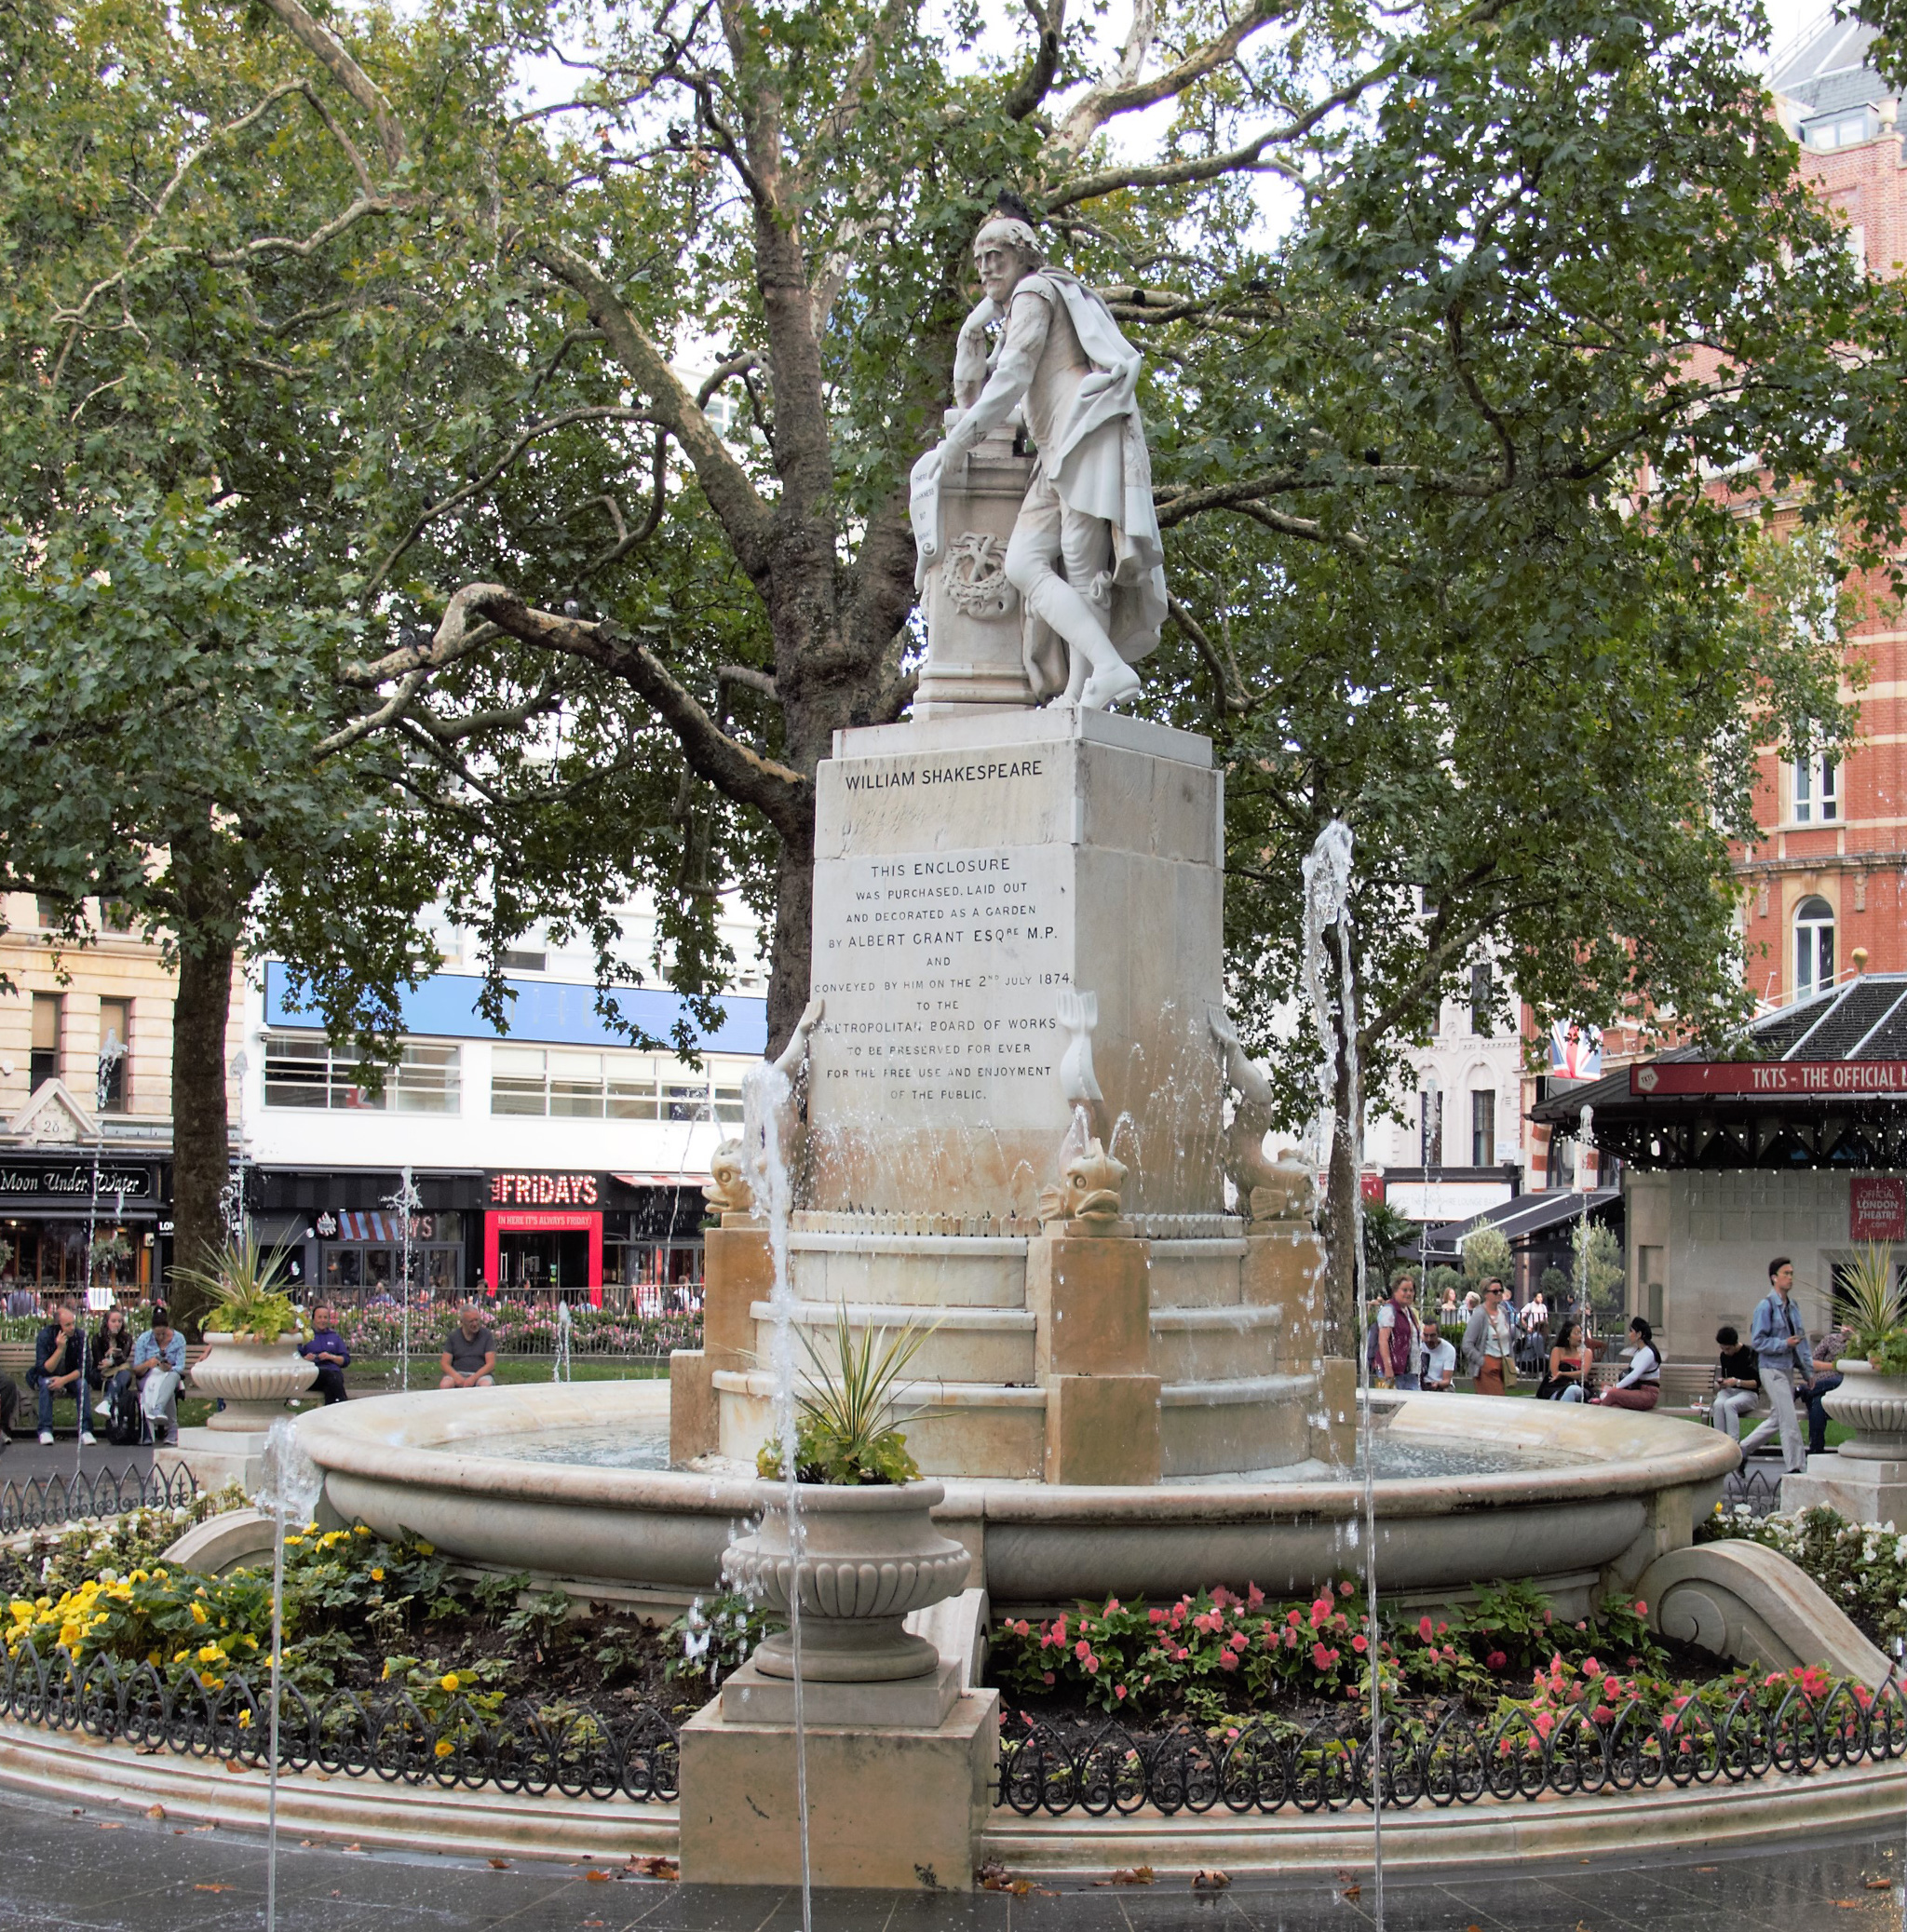 William Shakespeare Statue on London audio tour Theatreland Tour with Ian McKellen